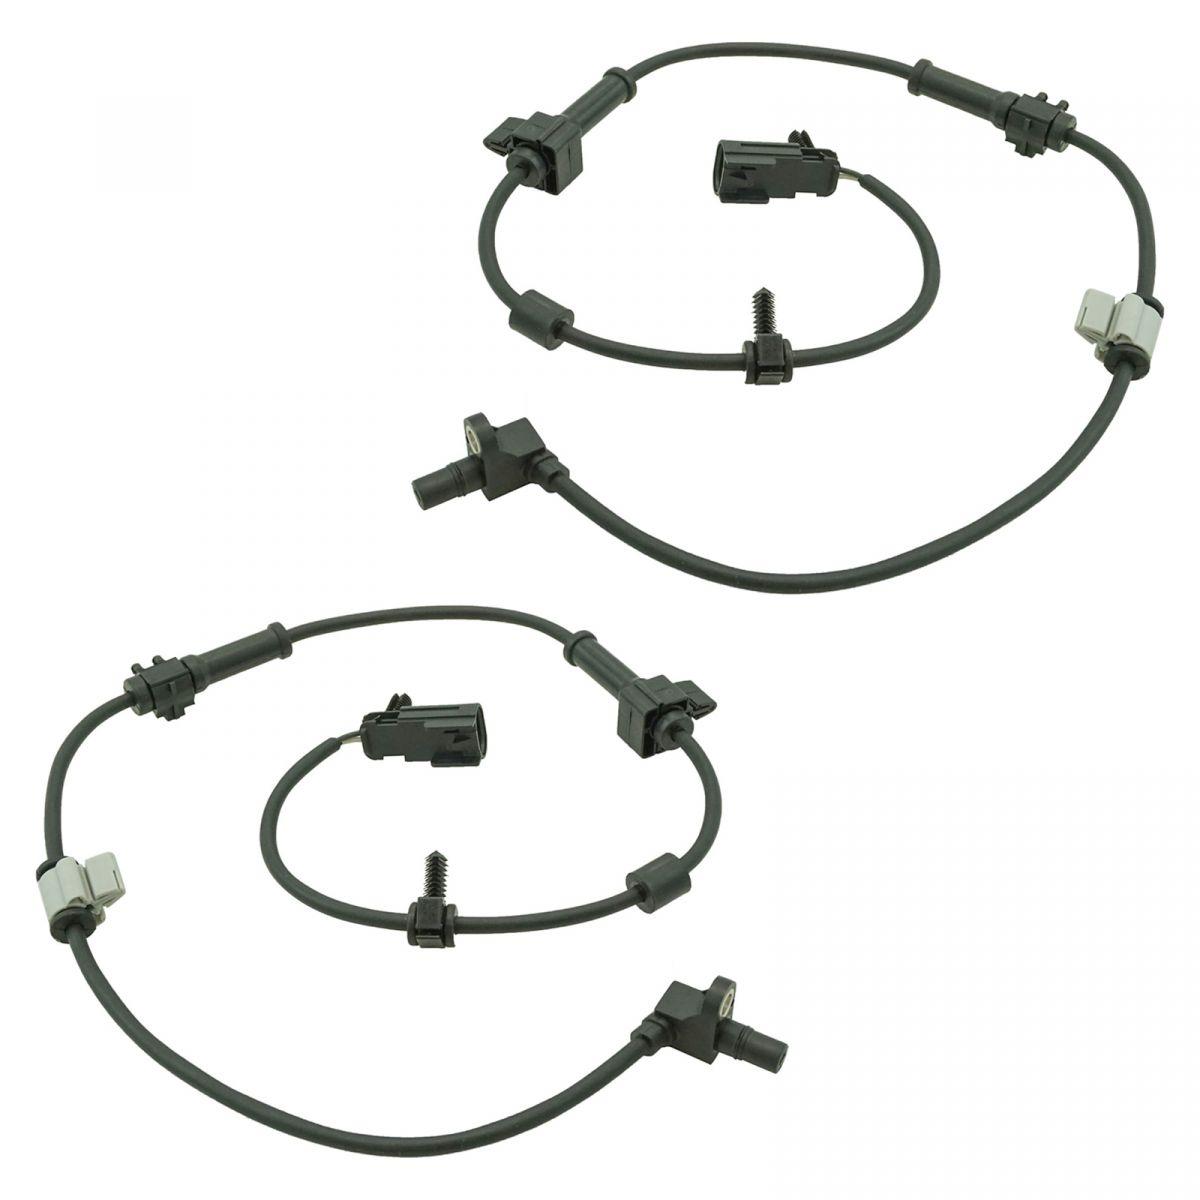 Abs Sensor Front Pair For Chevy Trailblazer Envoy 9 7x